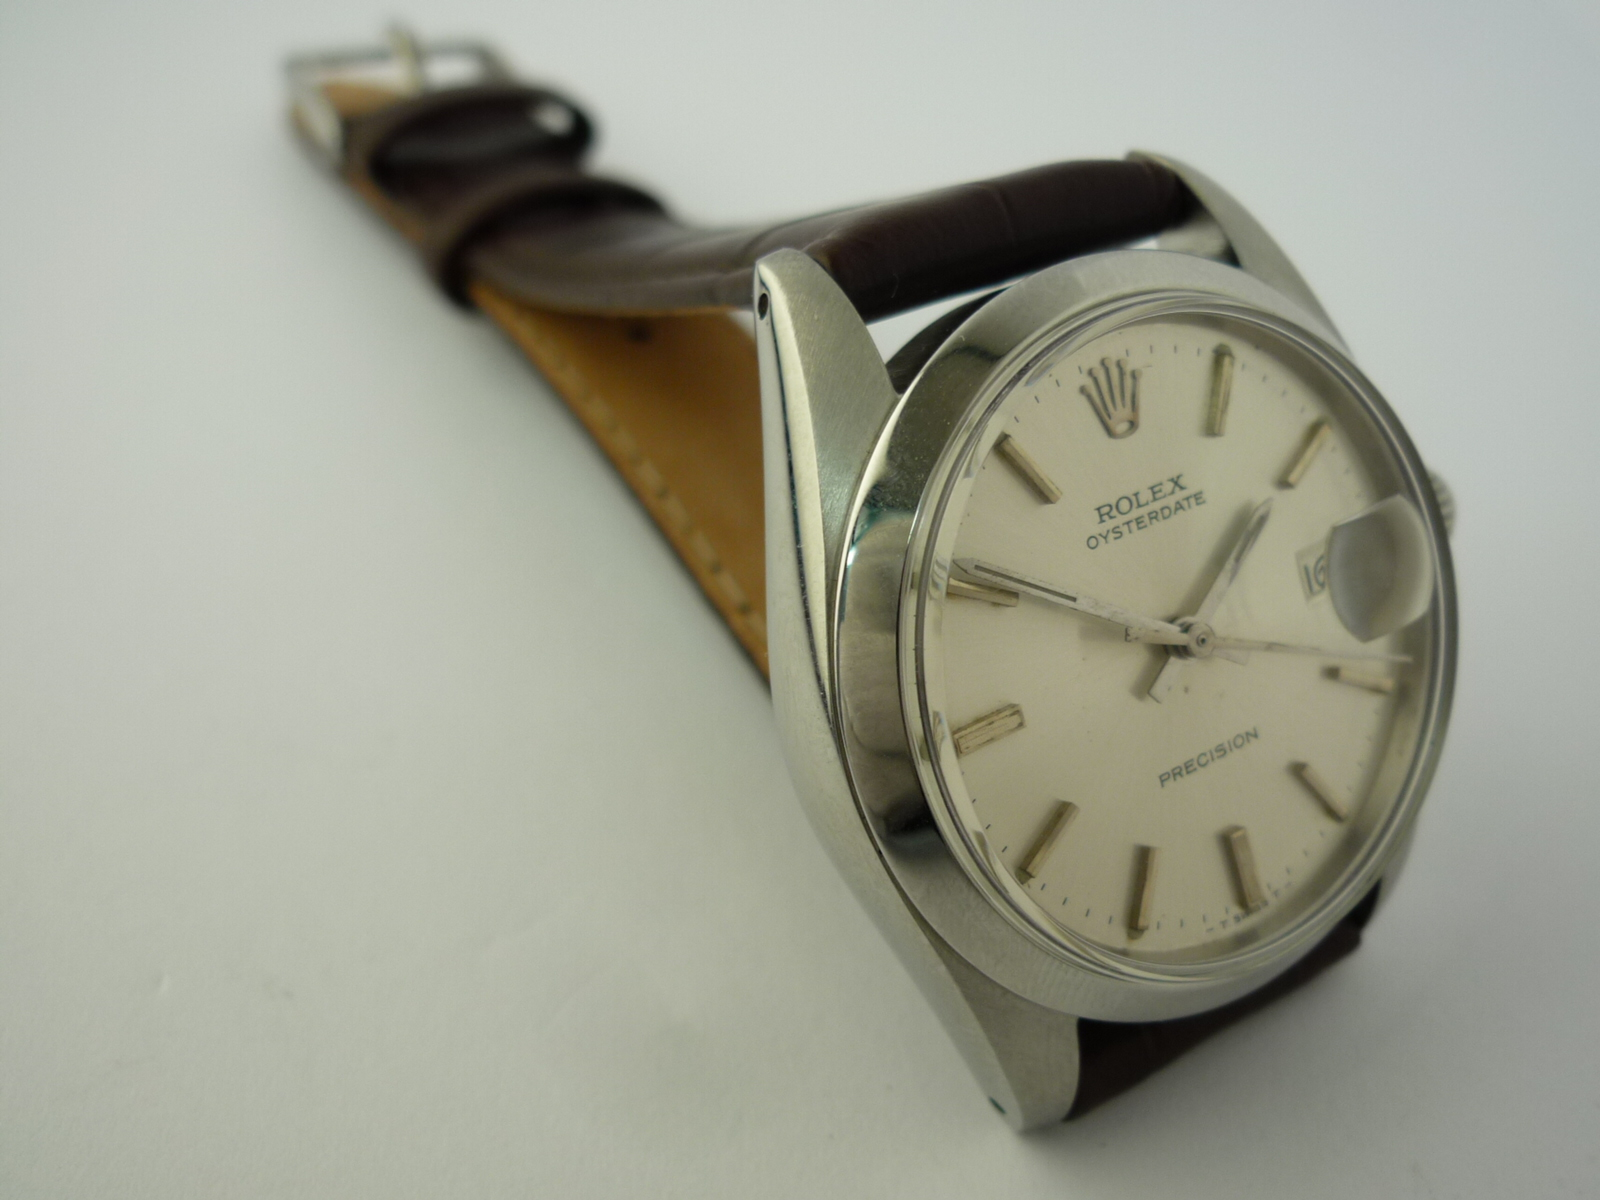 vintage rolex oysterdate precision watch ref 6694 1971. Black Bedroom Furniture Sets. Home Design Ideas